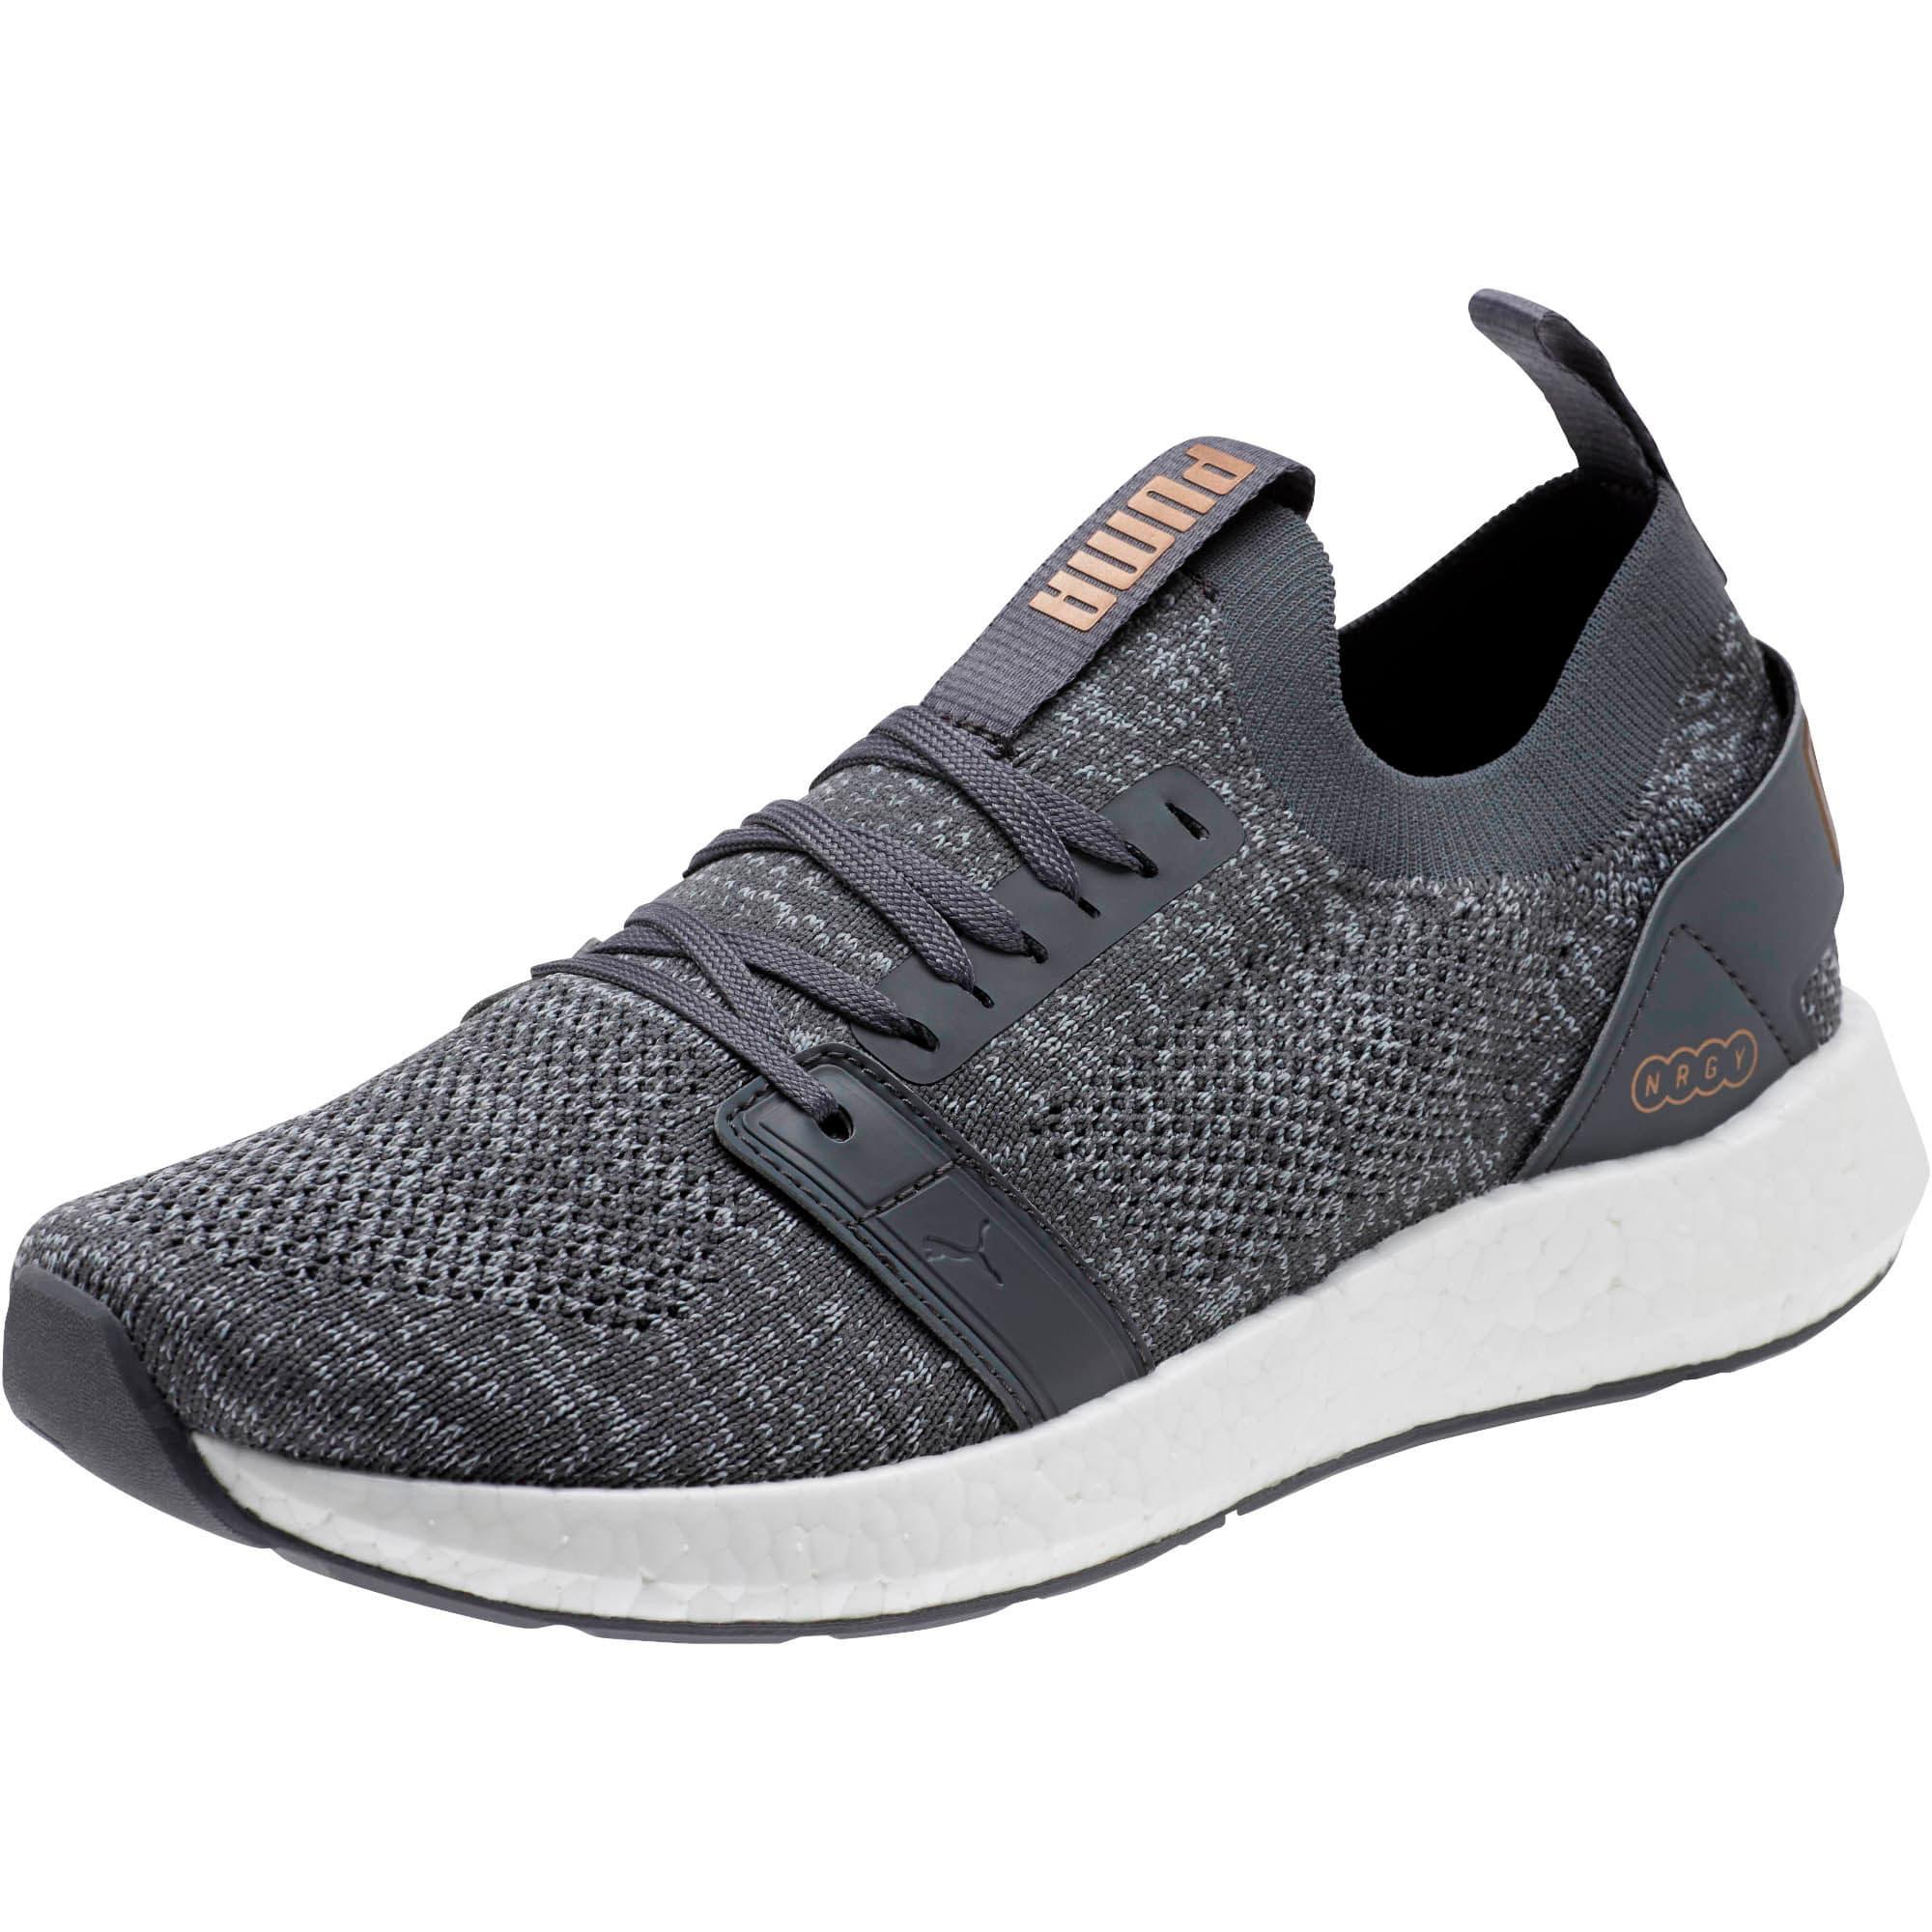 Thumbnail 1 of NRGY Neko Engineer Knit Women's Running Shoes, IronGate-Quarry-MtllicBrnze, medium